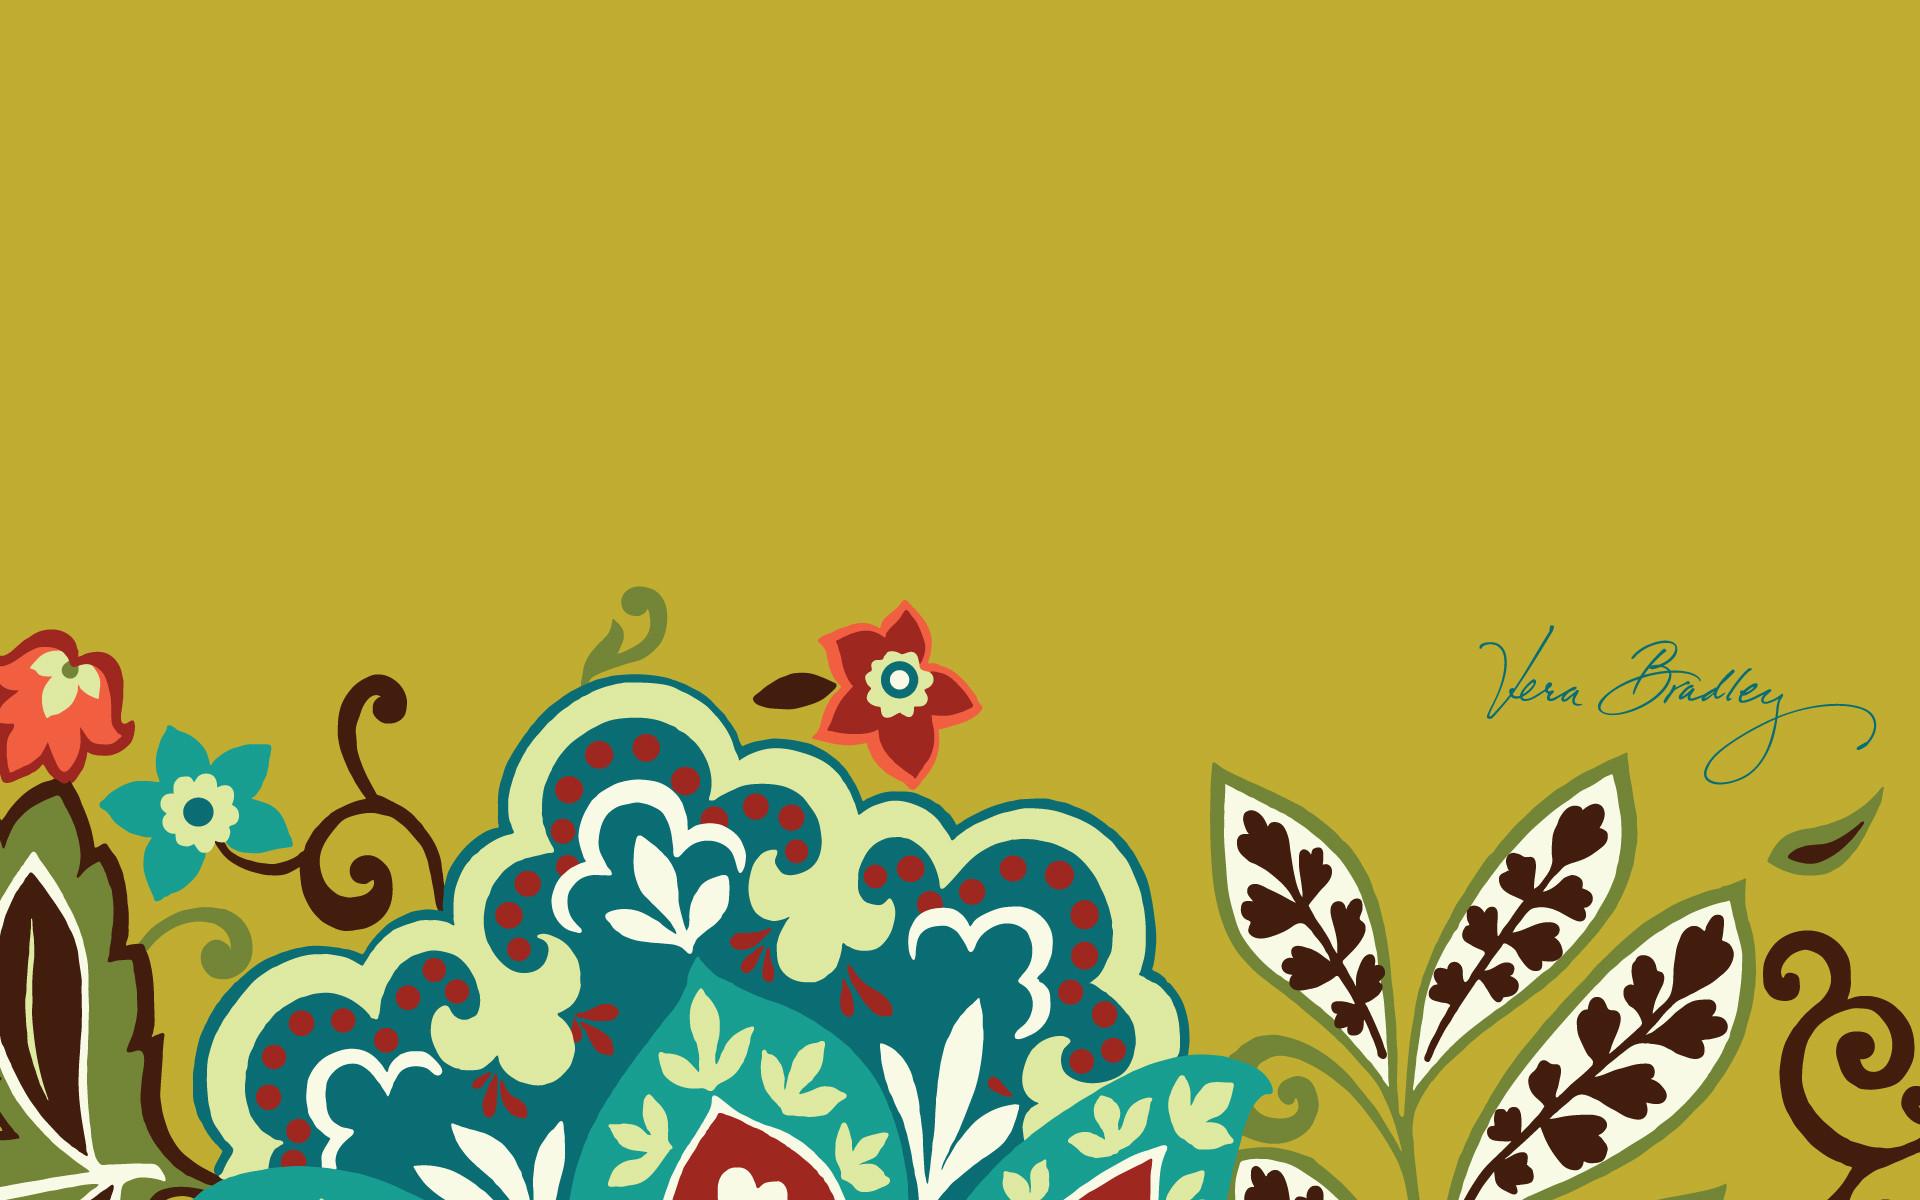 Vera Bradley Patterns wallpapers HD free – 391901